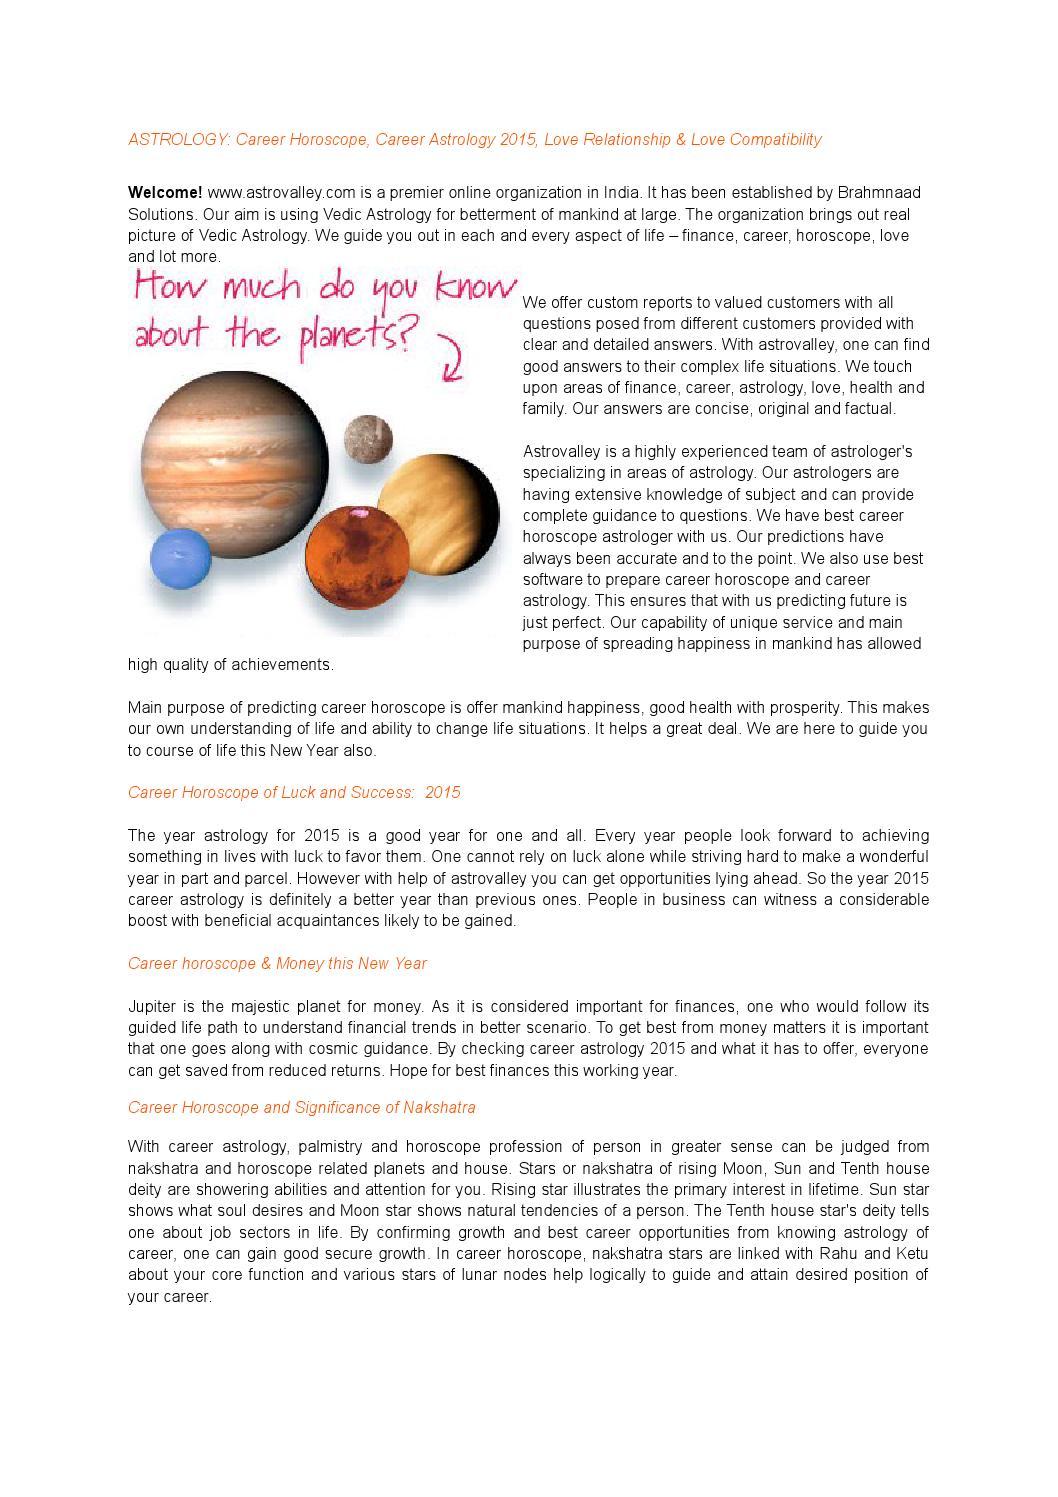 Career Astrology 2015, Career Horoscope, online astrologer by